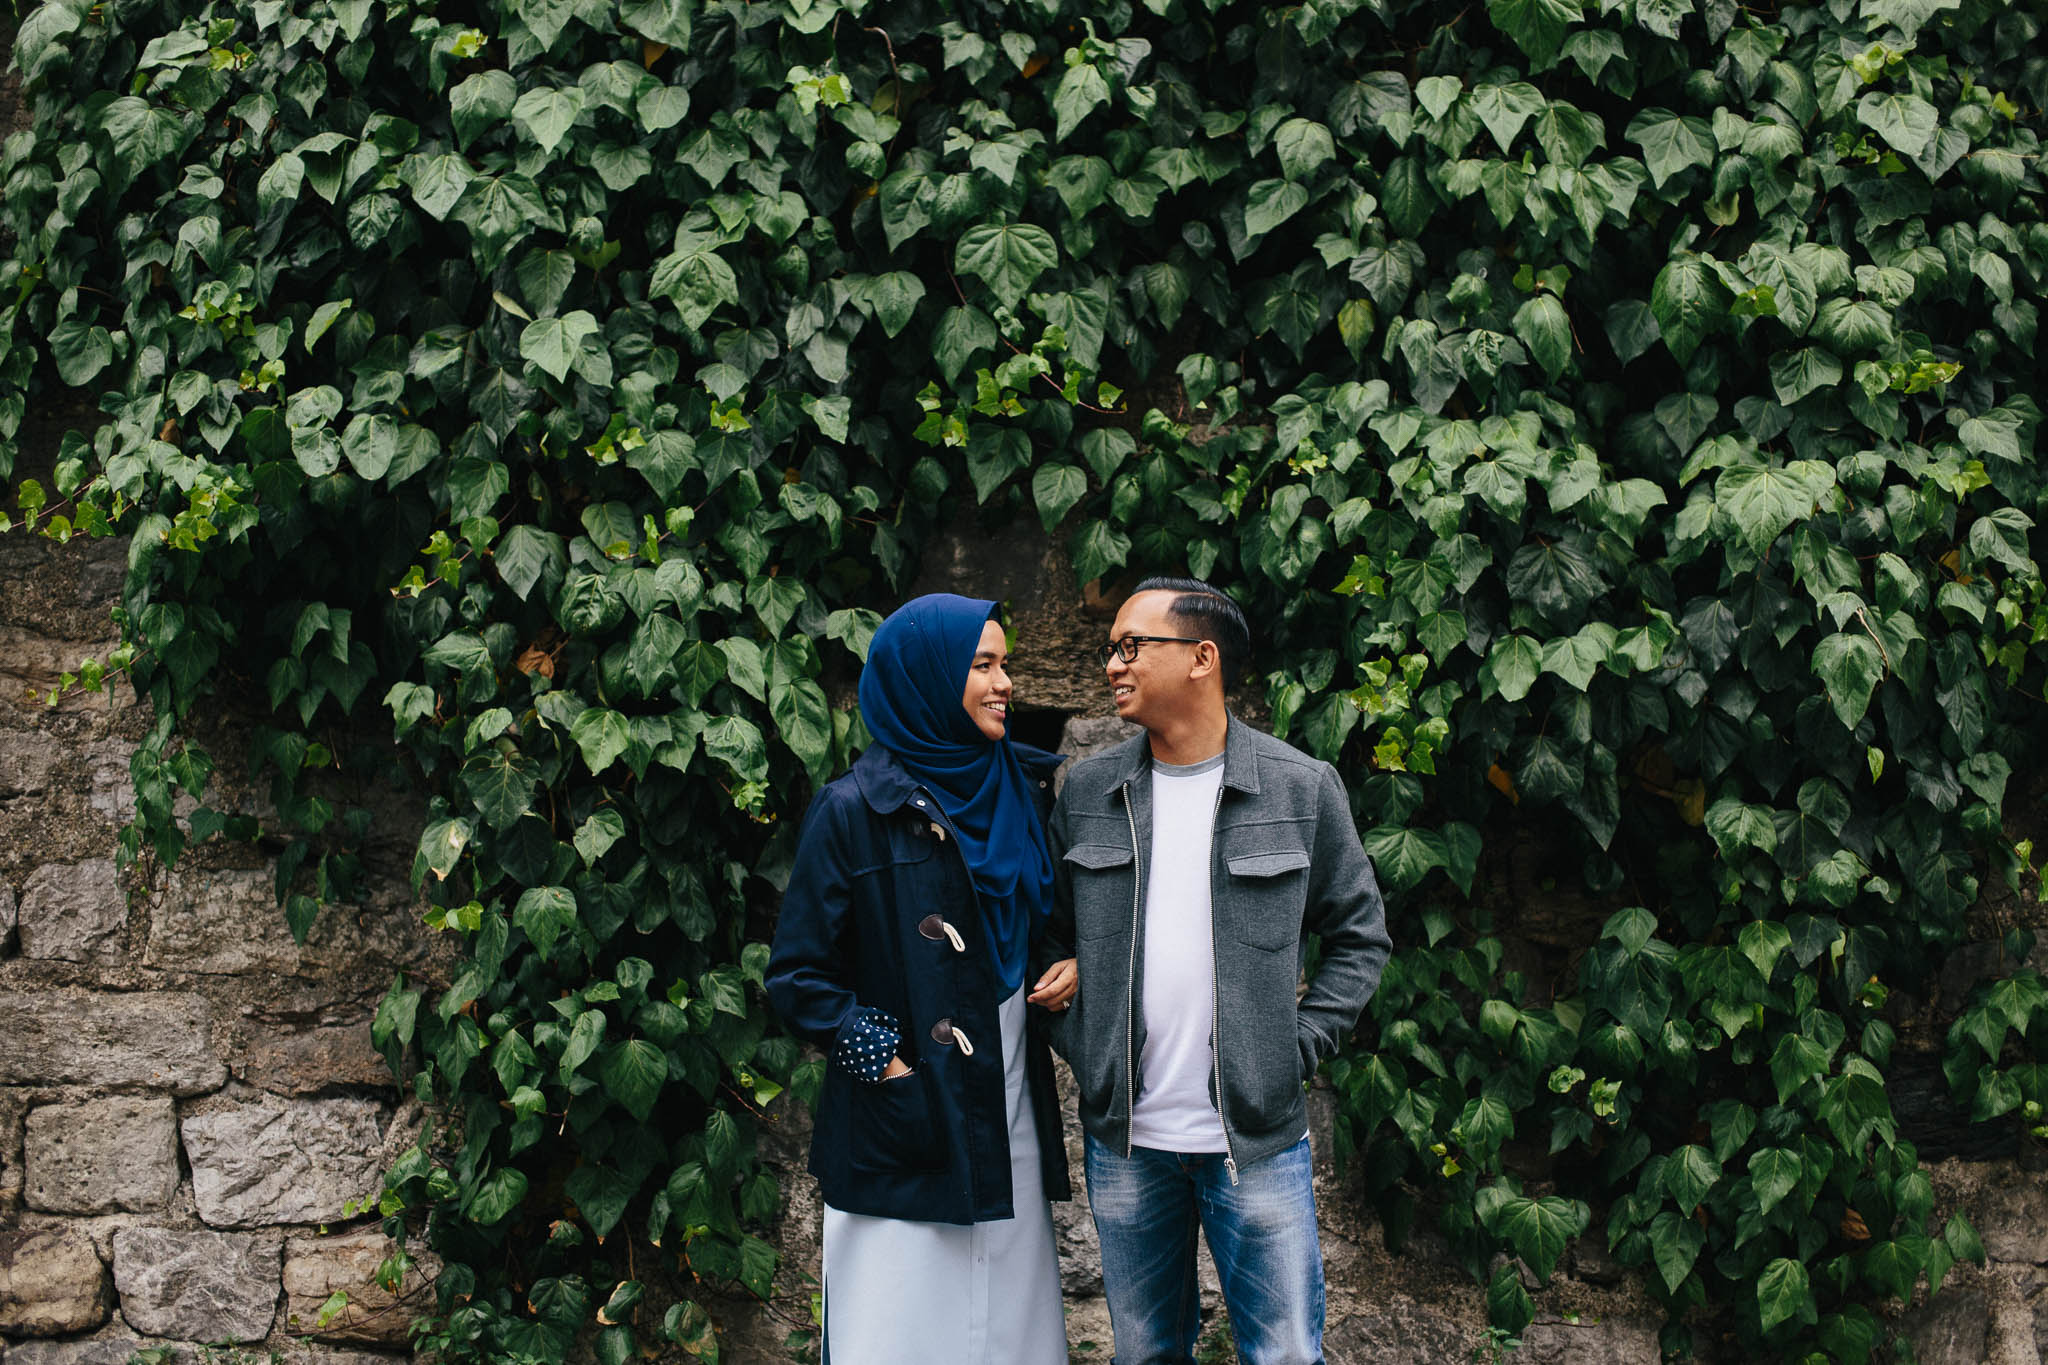 singapore-wedding-photographer-dzul-isma-istanbul-wmt-32.jpg